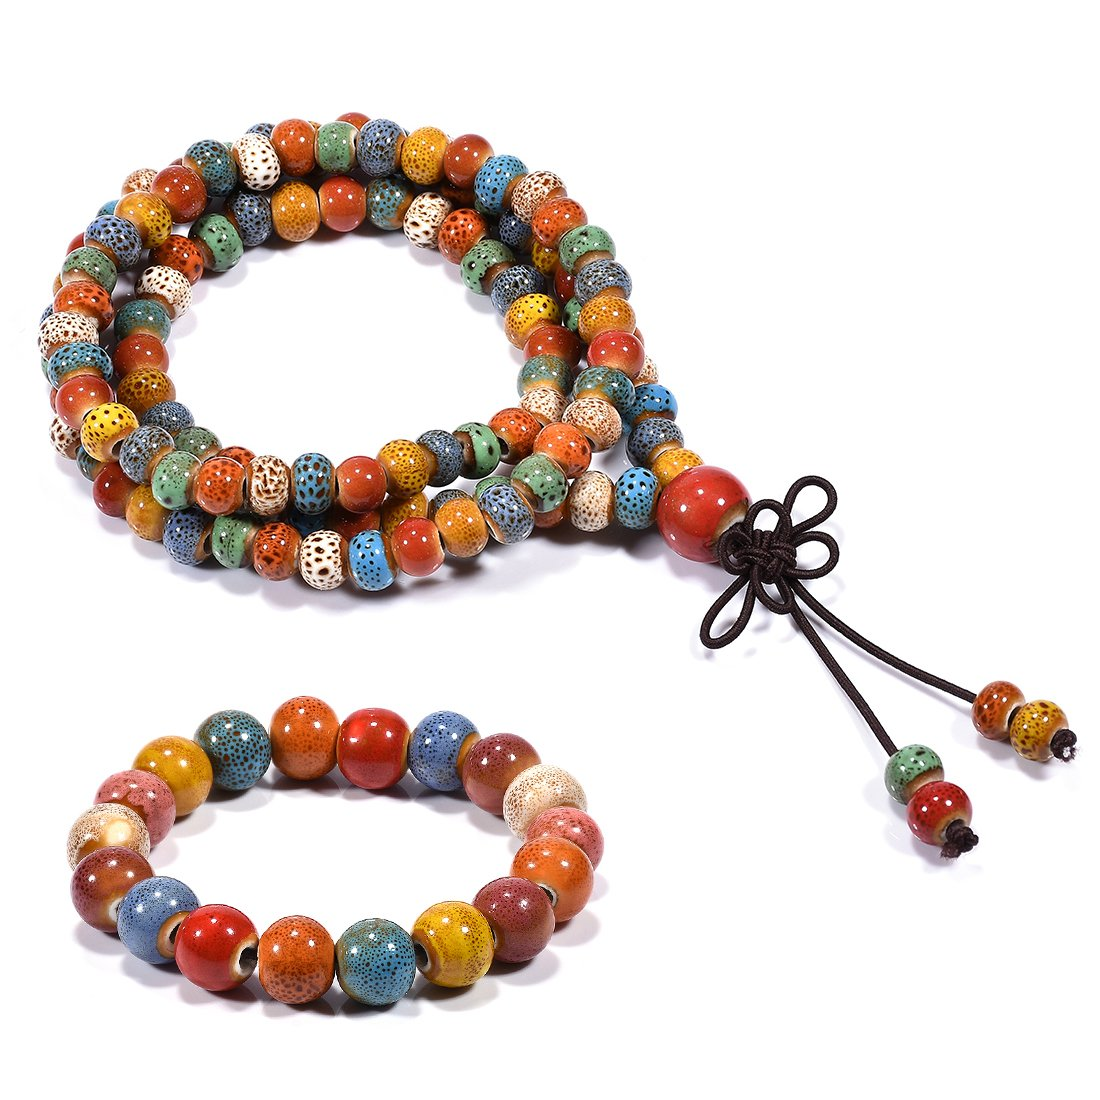 CAT EYE JEWELS 108 Porcelain Mala Beads Buddhist Tibetan Prayer Beads Meditation Necklace Bracelet Bohemia